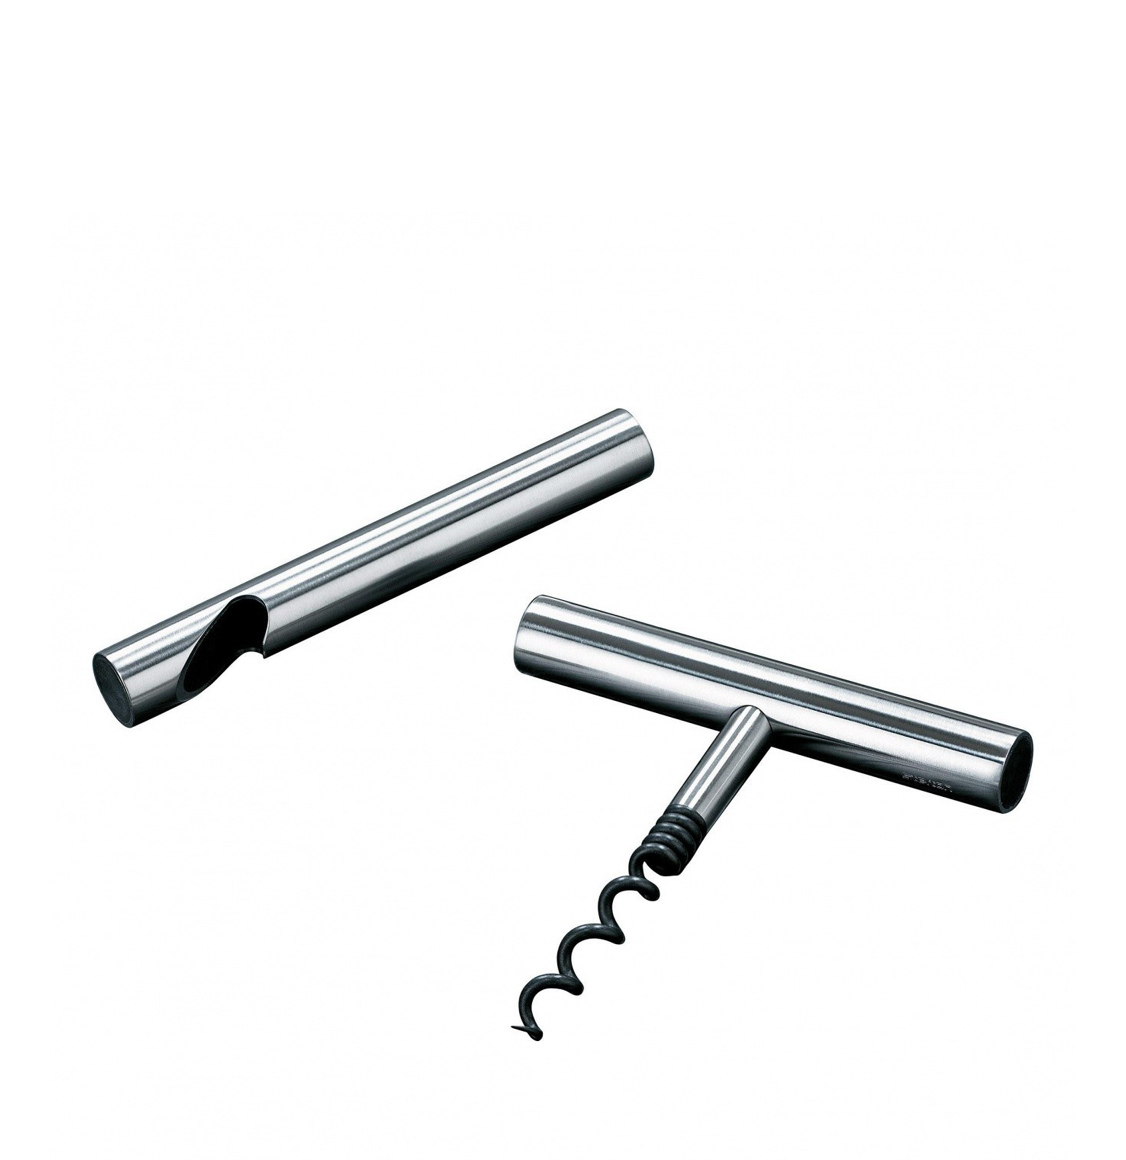 Stelton Stainless Steel Cork Screw